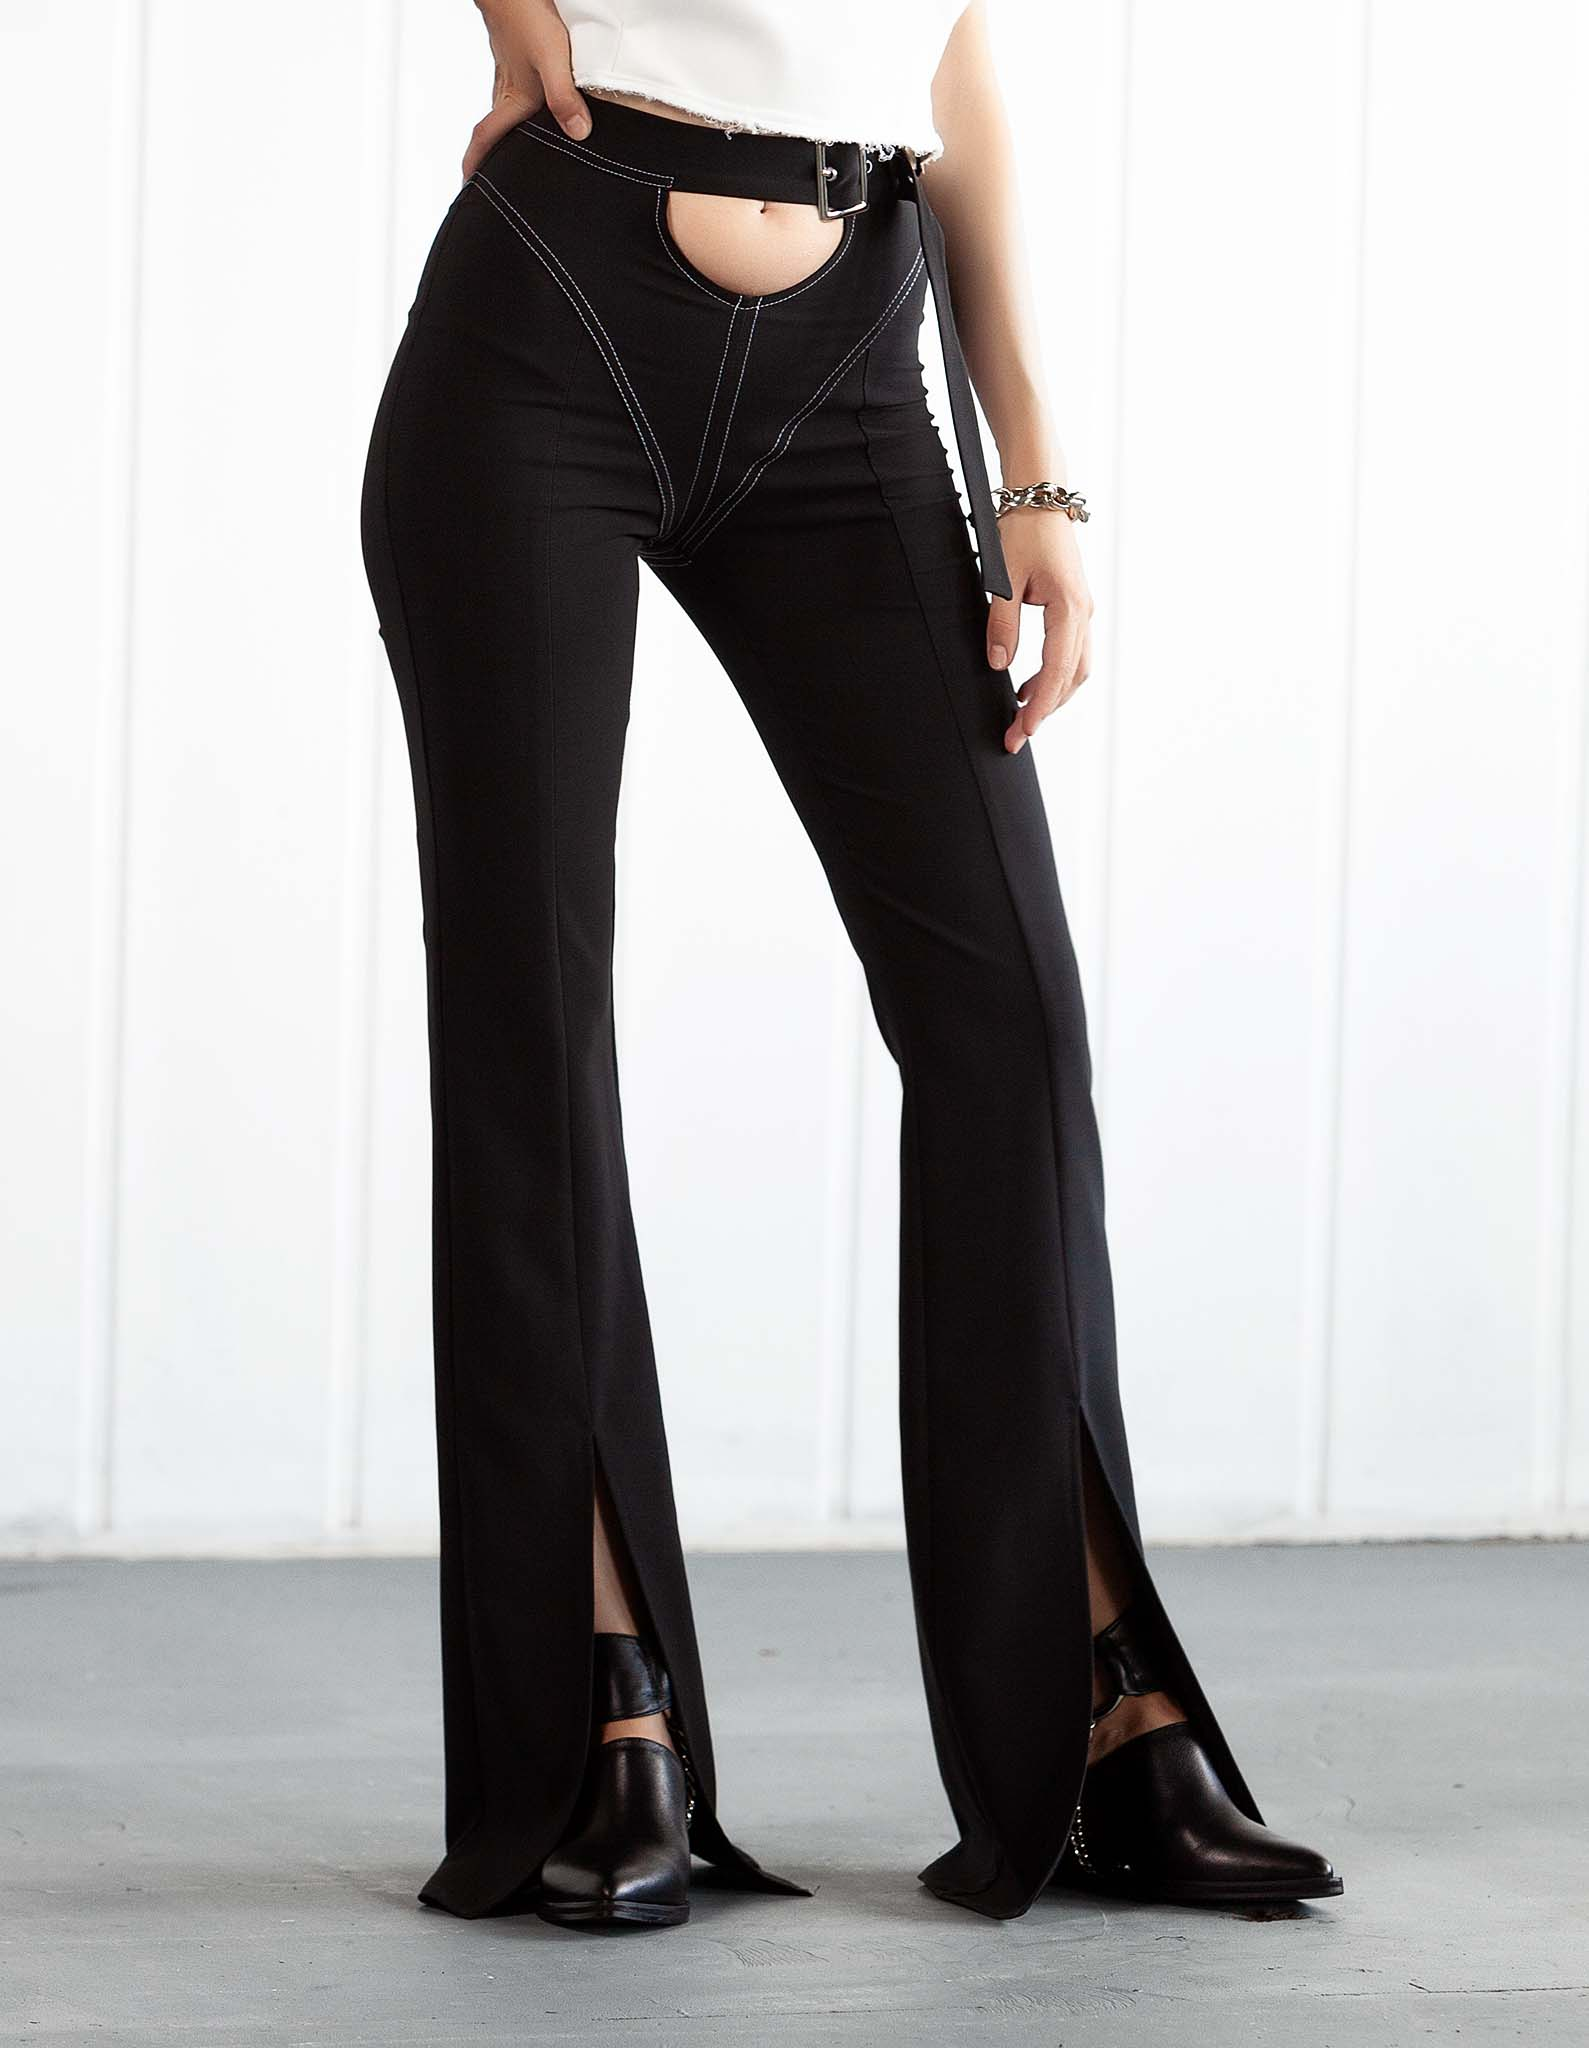 Pantalon negru cu detaliu alb L.A. BABE